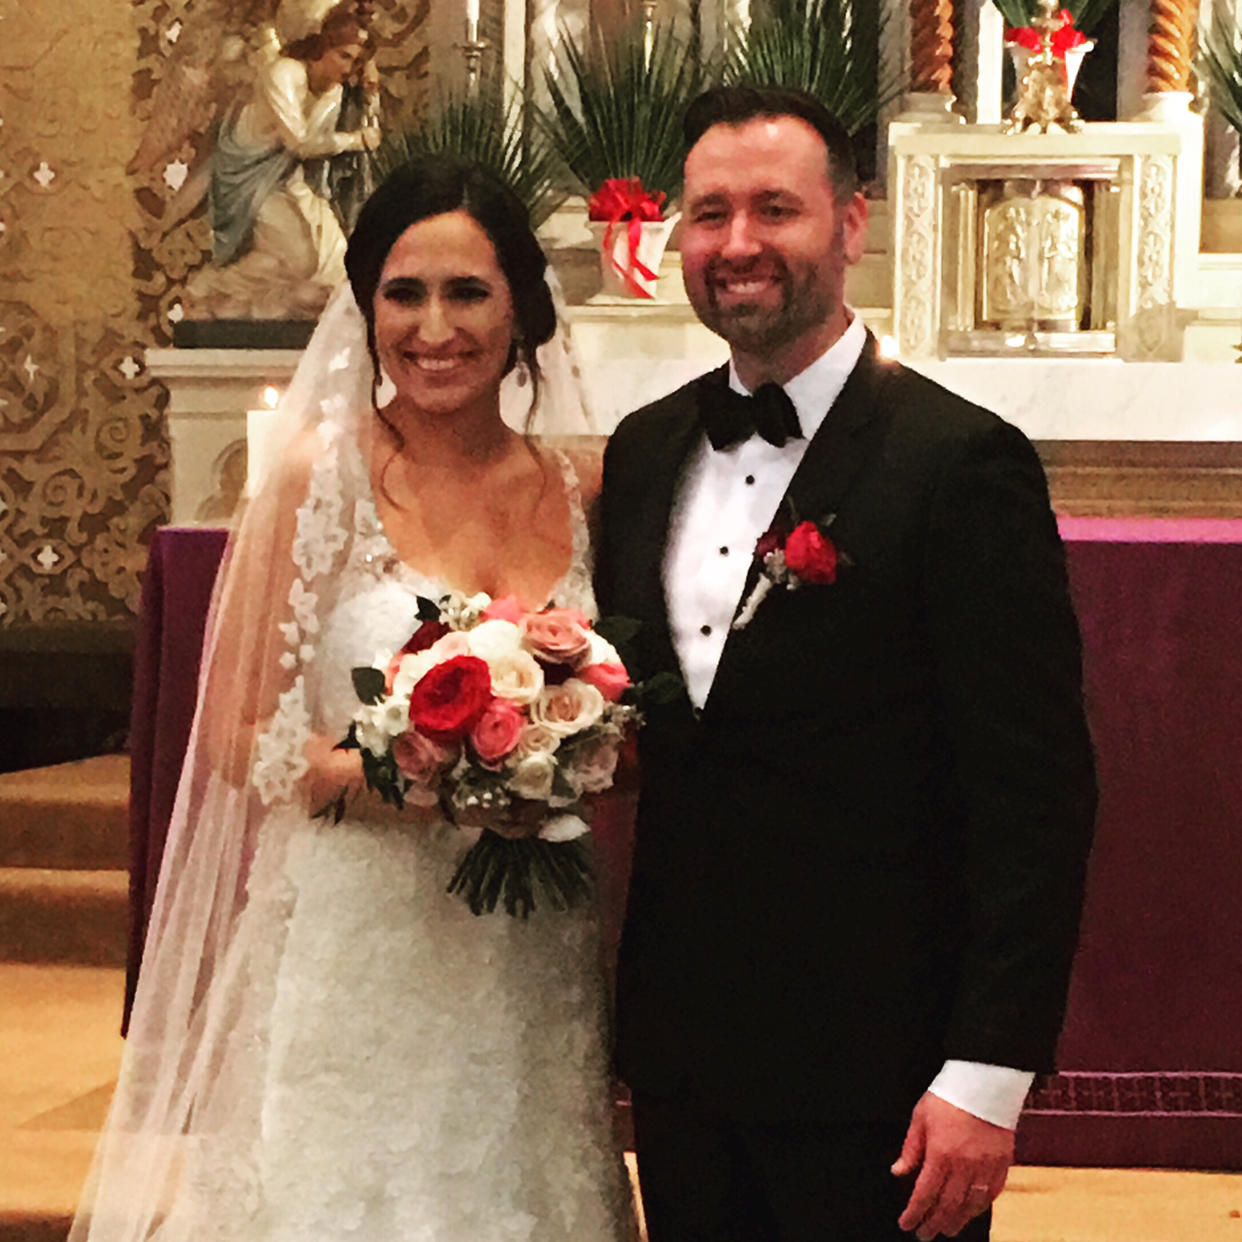 Sureshot Productions: Chicago Wedding Video image 1